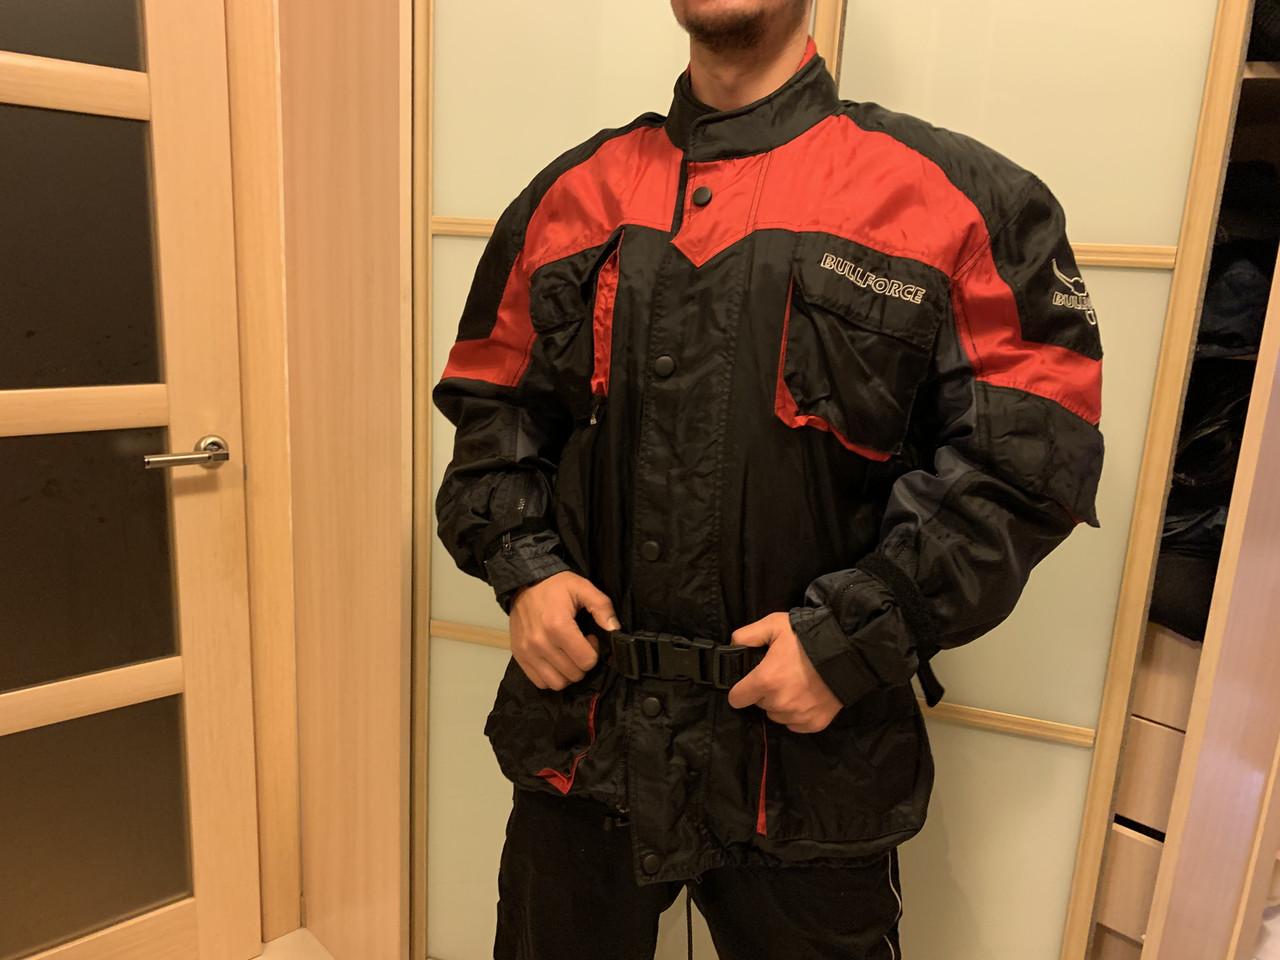 Защитная мото Куртка BullForce оригинал с Европы  со съемной защитой